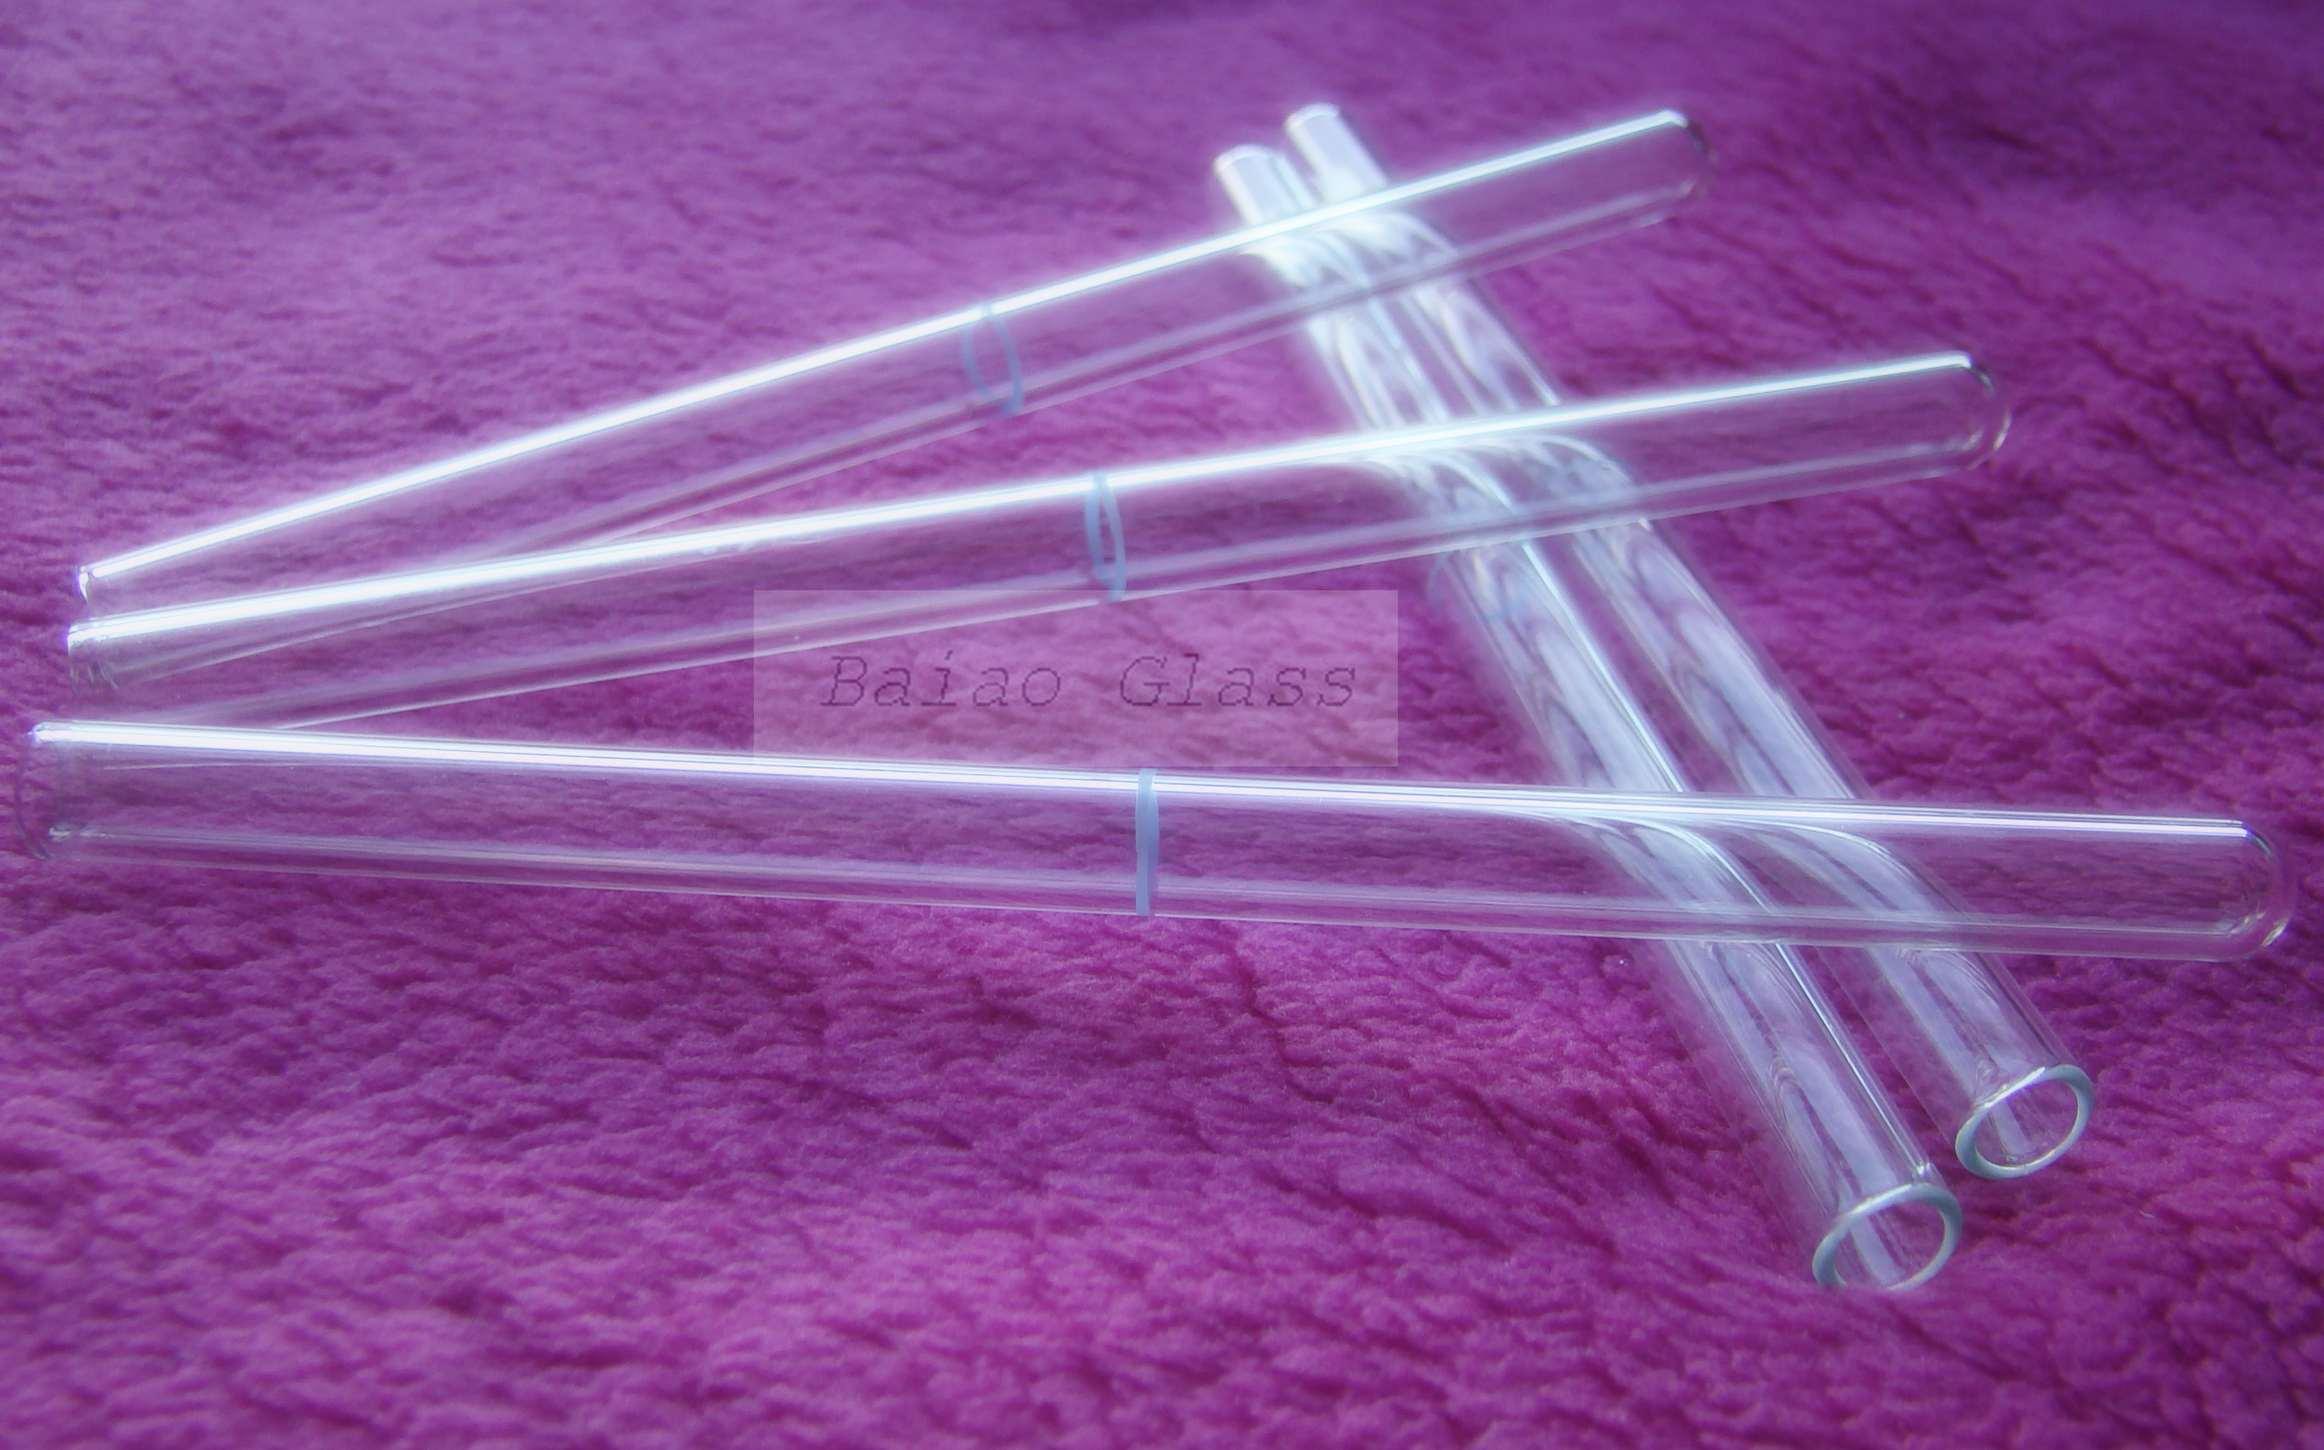 China 8x120mm test tubes china test tube glass test tube for Glass test tubes for crafts